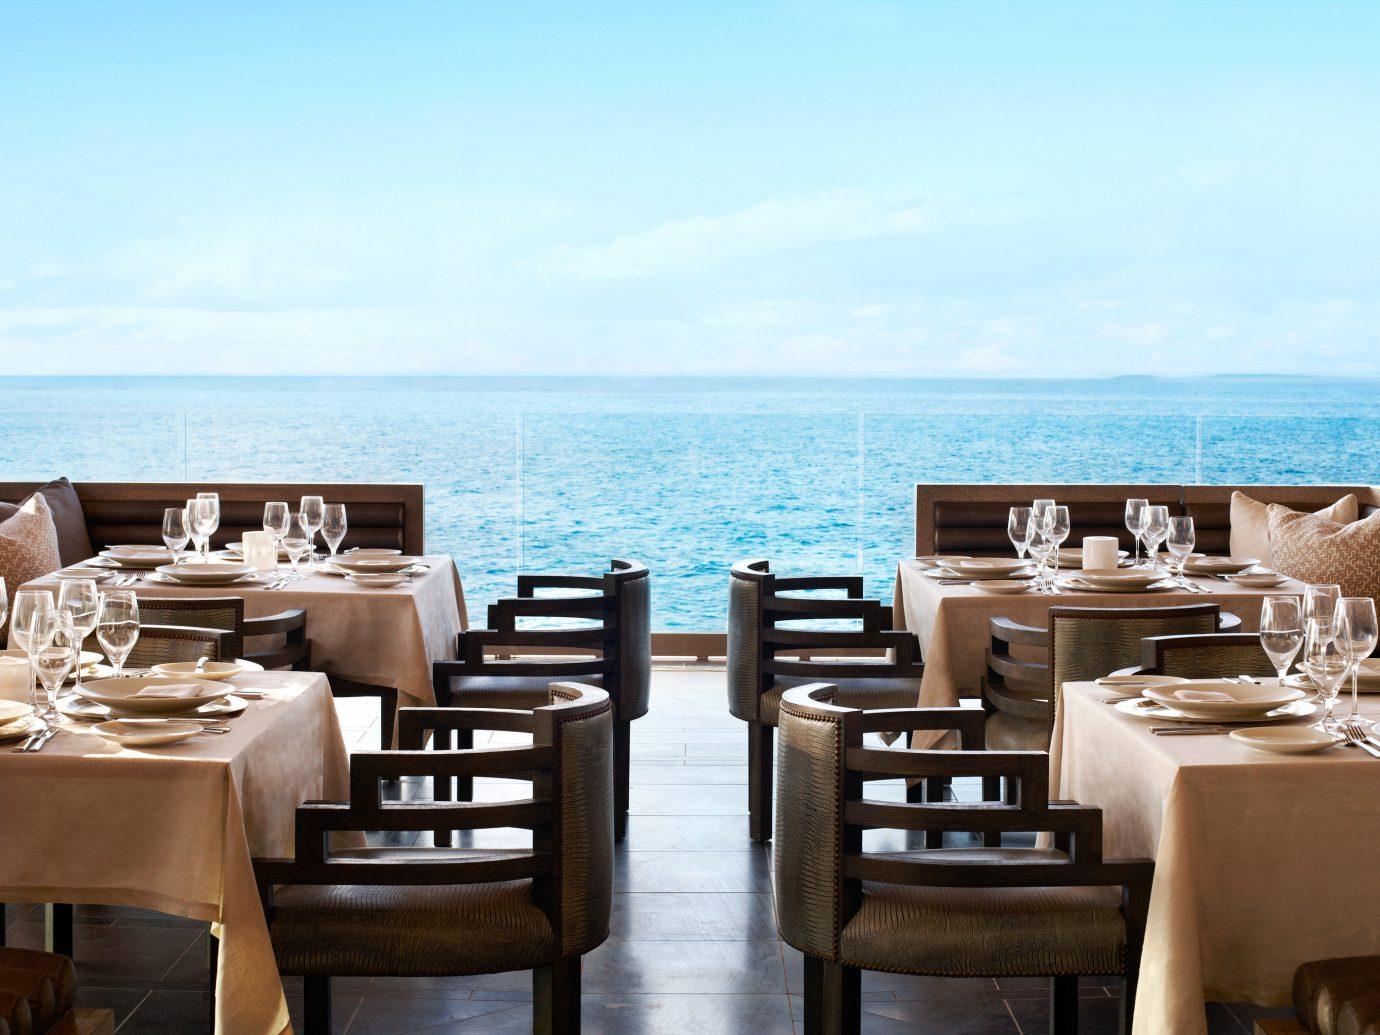 Bar Beach Beachfront Dining Drink Eat Ocean Trip Ideas sky water table chair restaurant passenger ship yacht vehicle meal estate Resort Boat luxury yacht overlooking